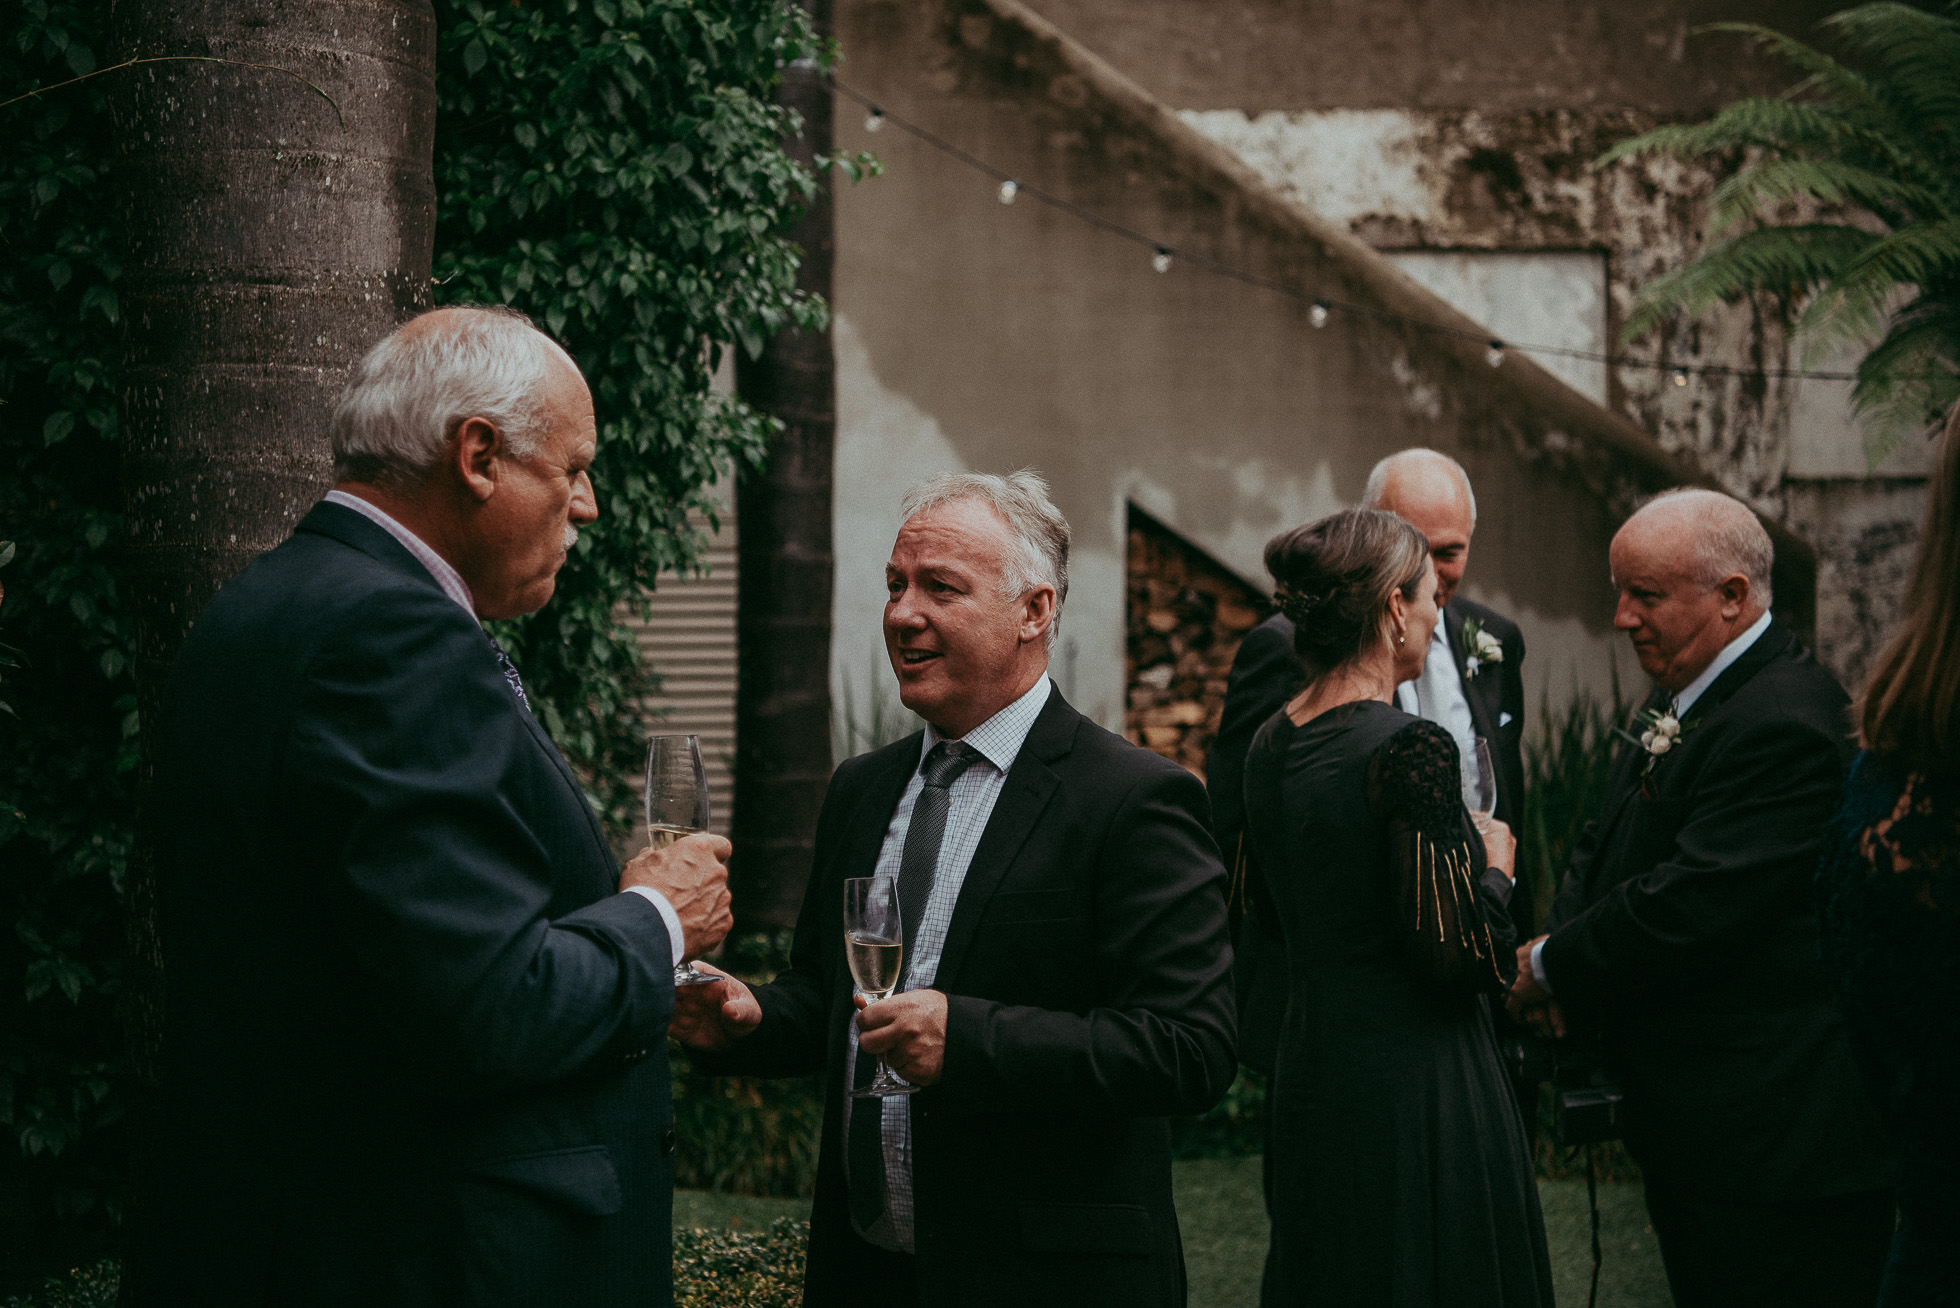 wedding-by-levien-578.JPG